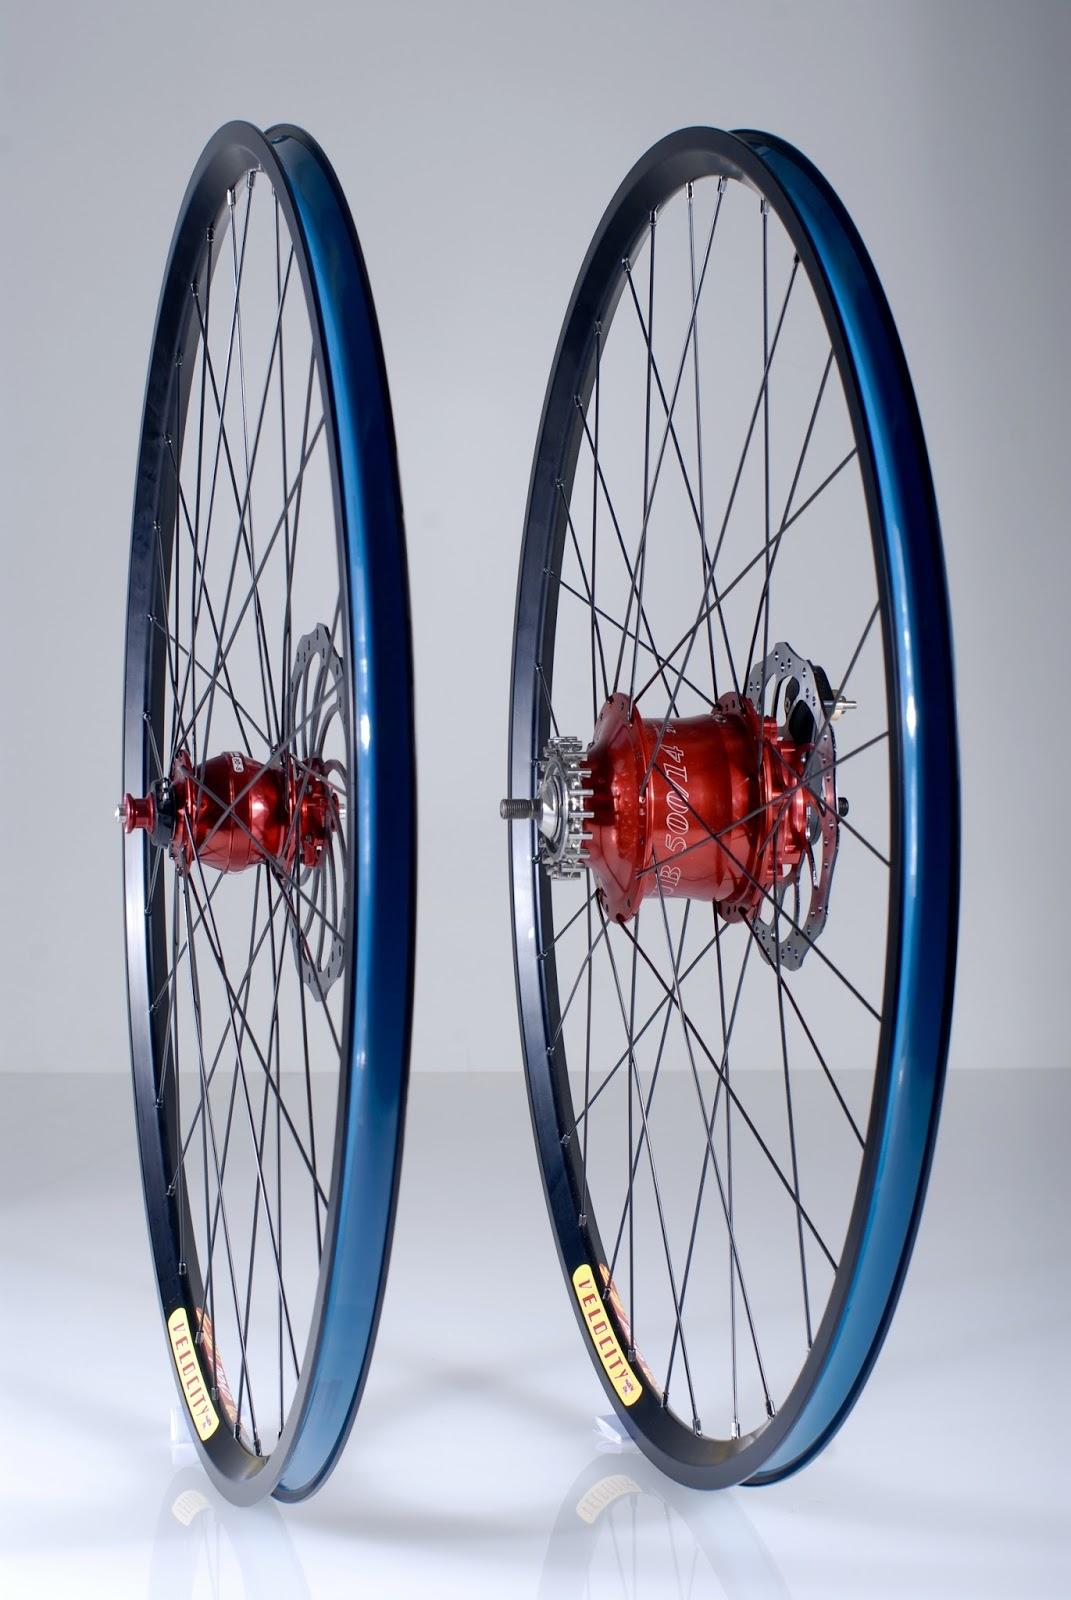 Cycle Monkey Wheel House Commuting Touring Velocity Dyad